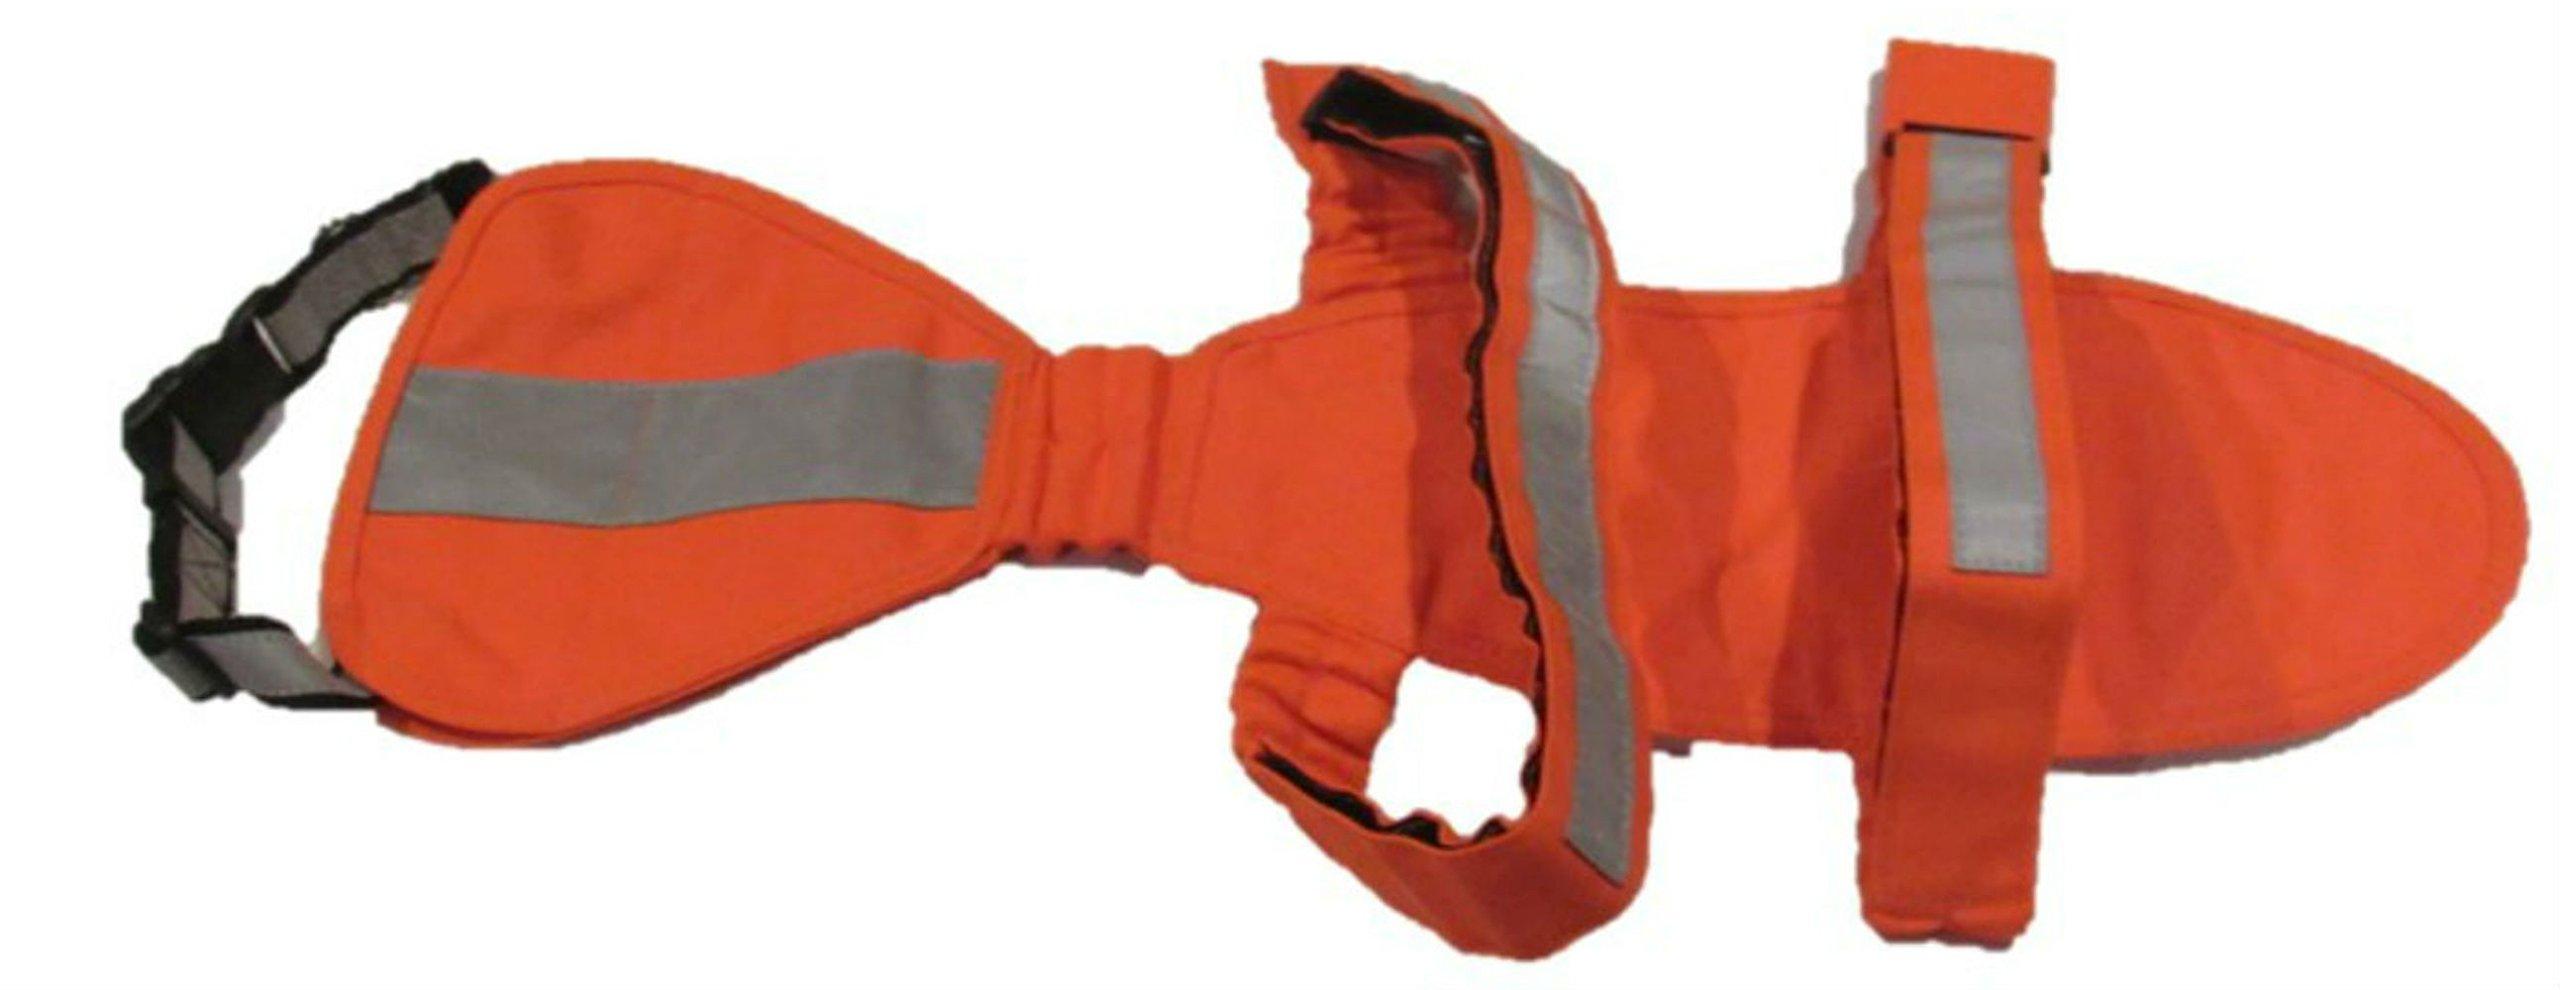 DOGonGEAR Dog hunting Vest (UnderBelly & Chest Protection) Medium 25 lb to 55 lb Safety Orange